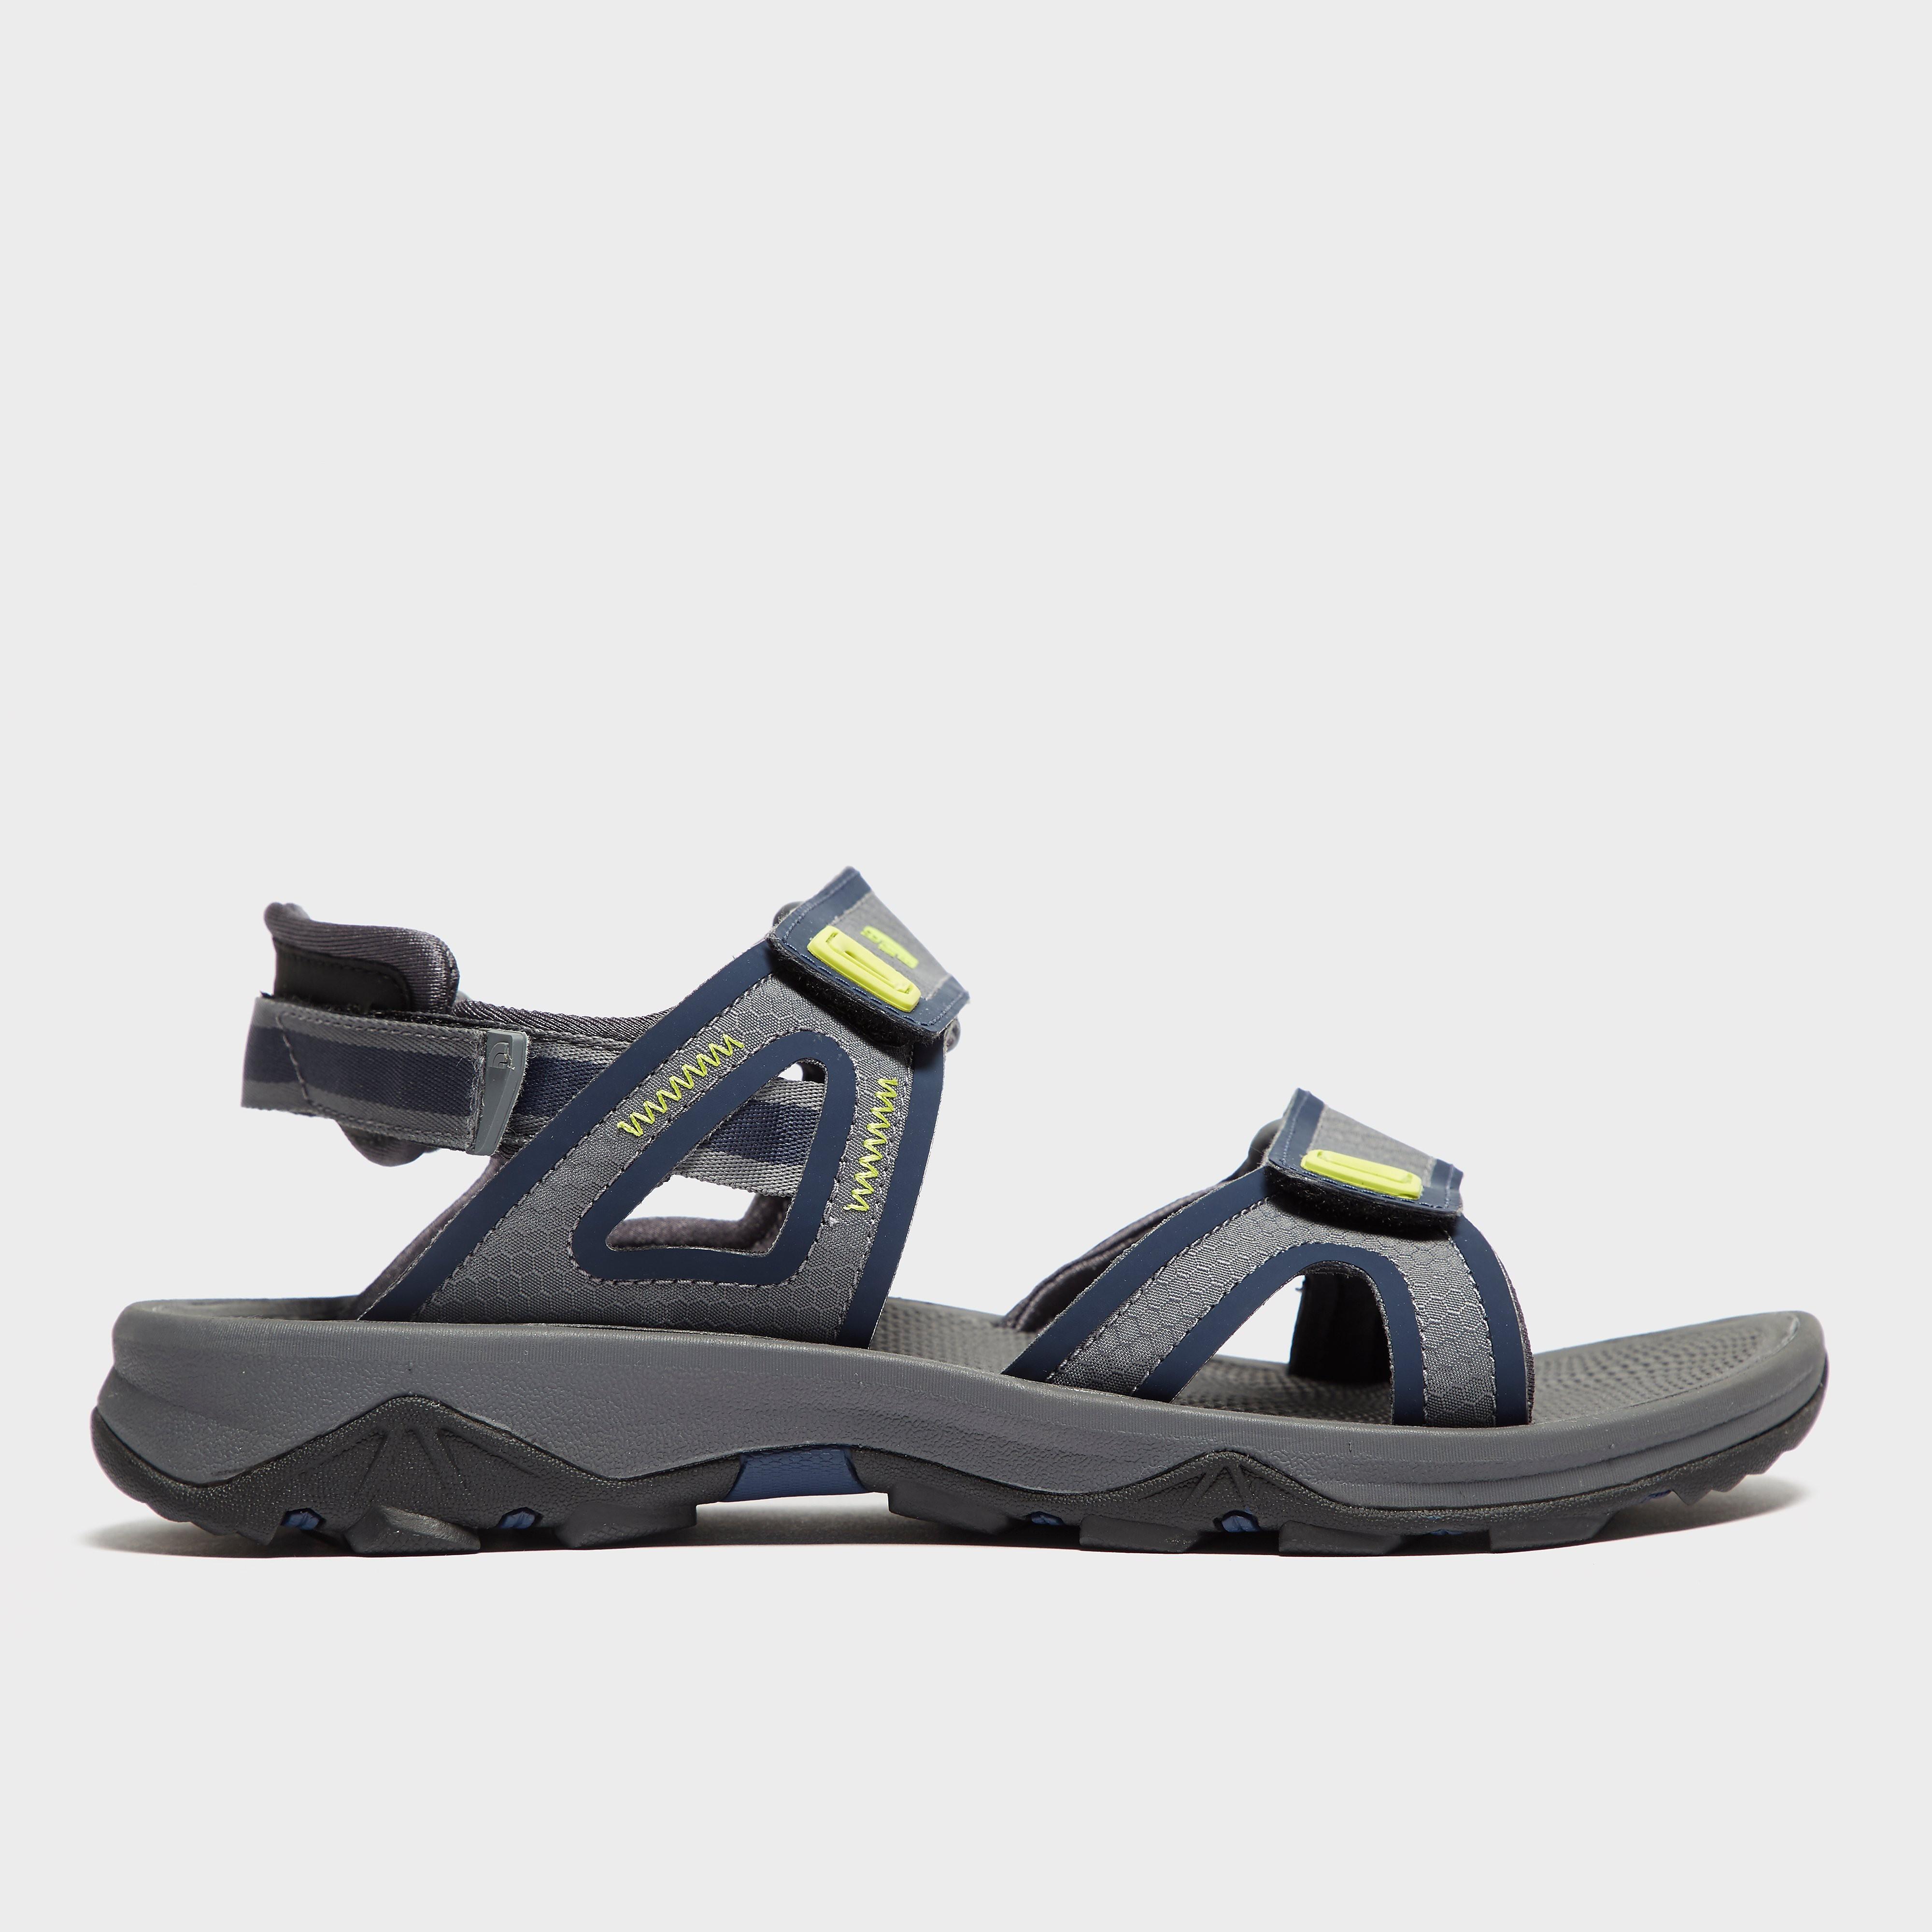 The North Face Hedgehog Men's Sandals